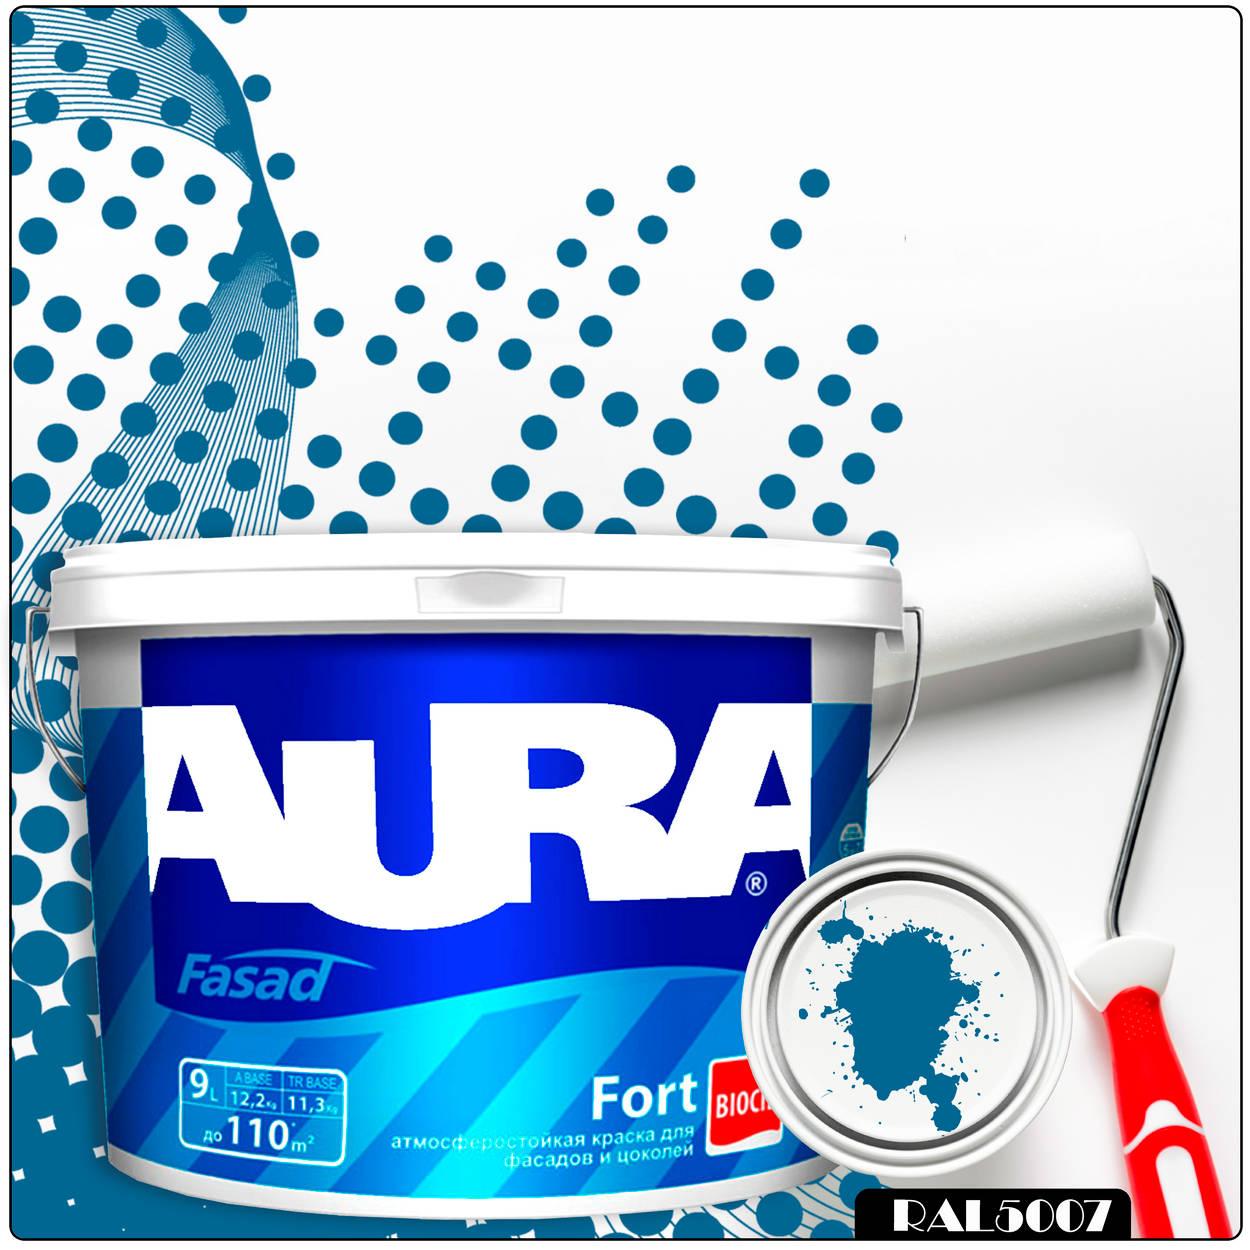 Фото 7 - Краска Aura Fasad Fort, RAL 5007 Бриллиантово-синий, латексная, матовая, для фасада и цоколей, 9л, Аура.